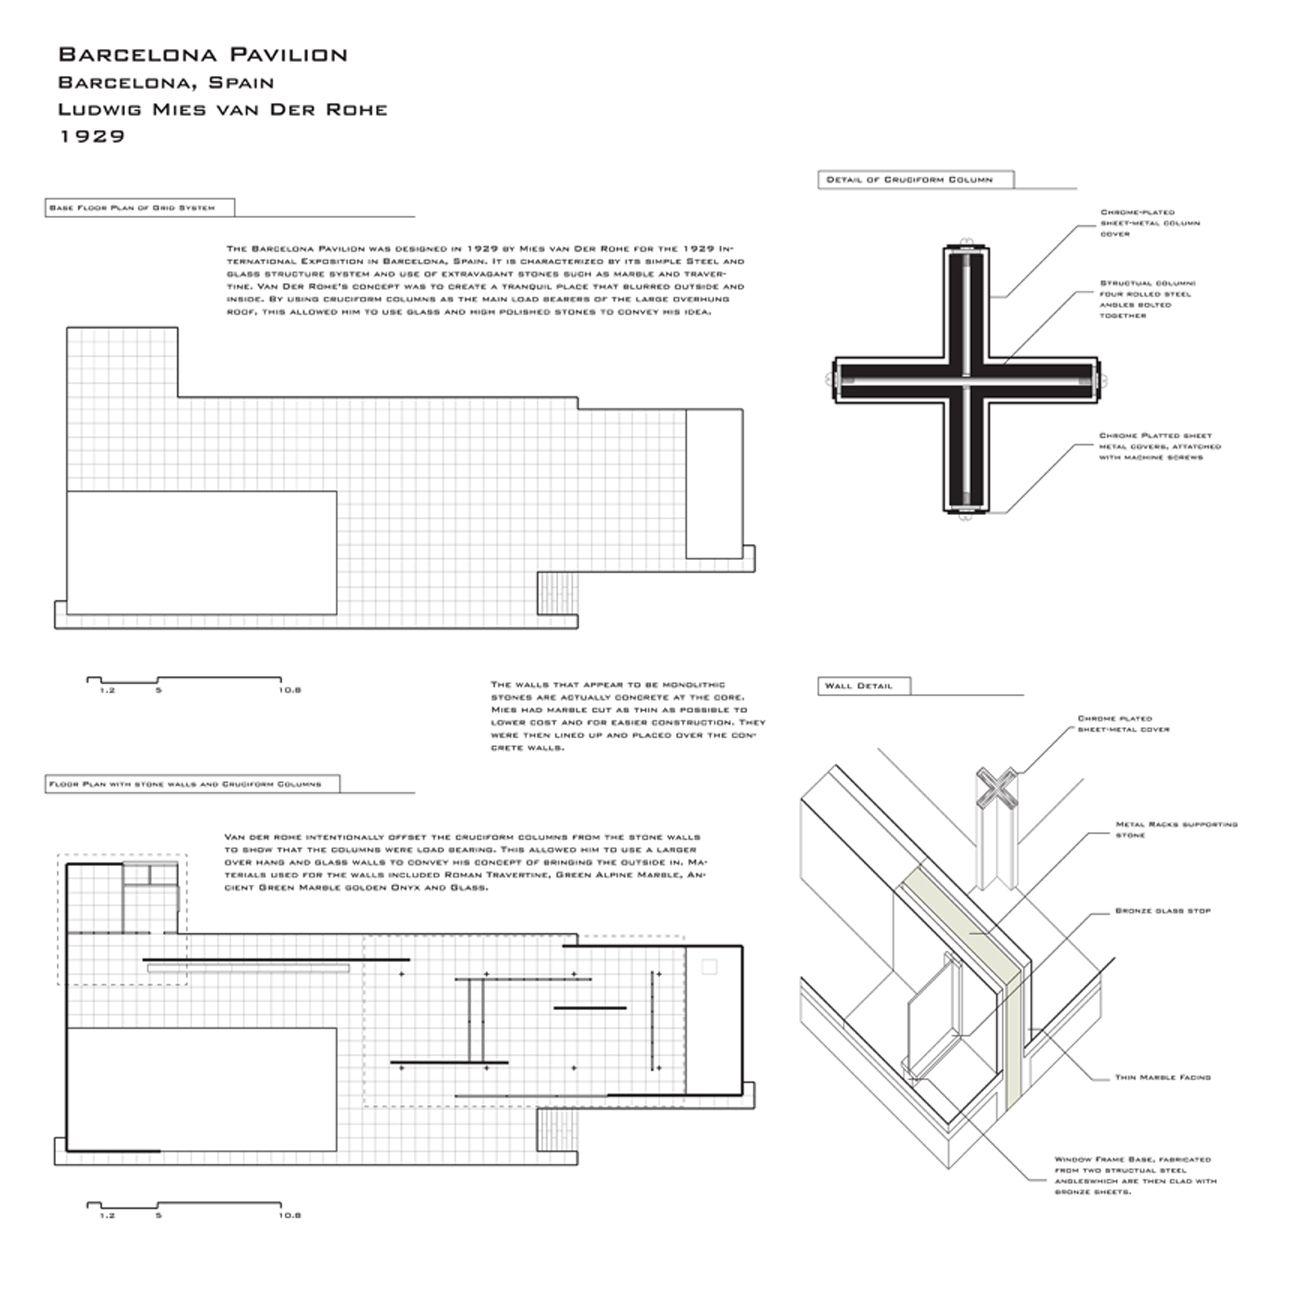 Architecture As Aesthetics Barcelona Pavilion Arquitectura Modulos Arquitectura Contemporanea Arquitectura Moderna